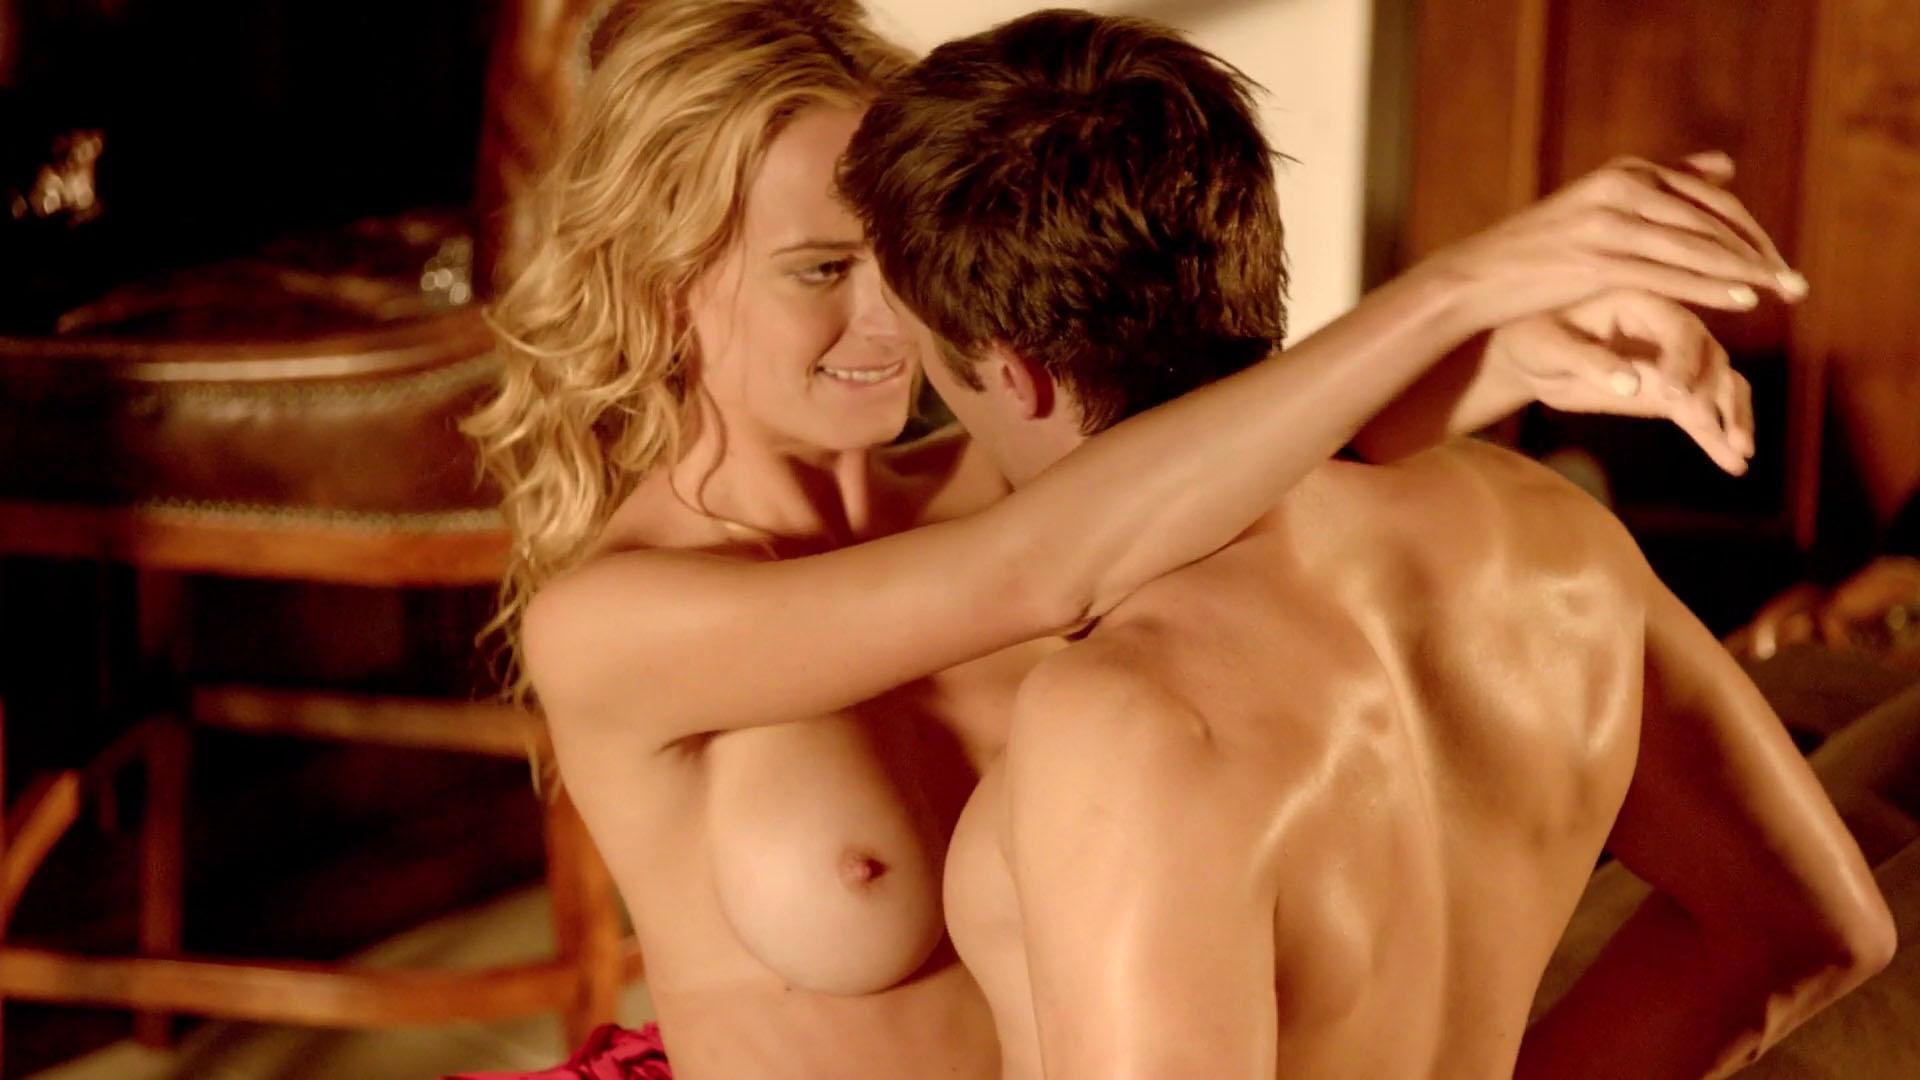 Angela Kinsey Nude Scene watch online - jena sims – american beach house (2015) hd 1080p